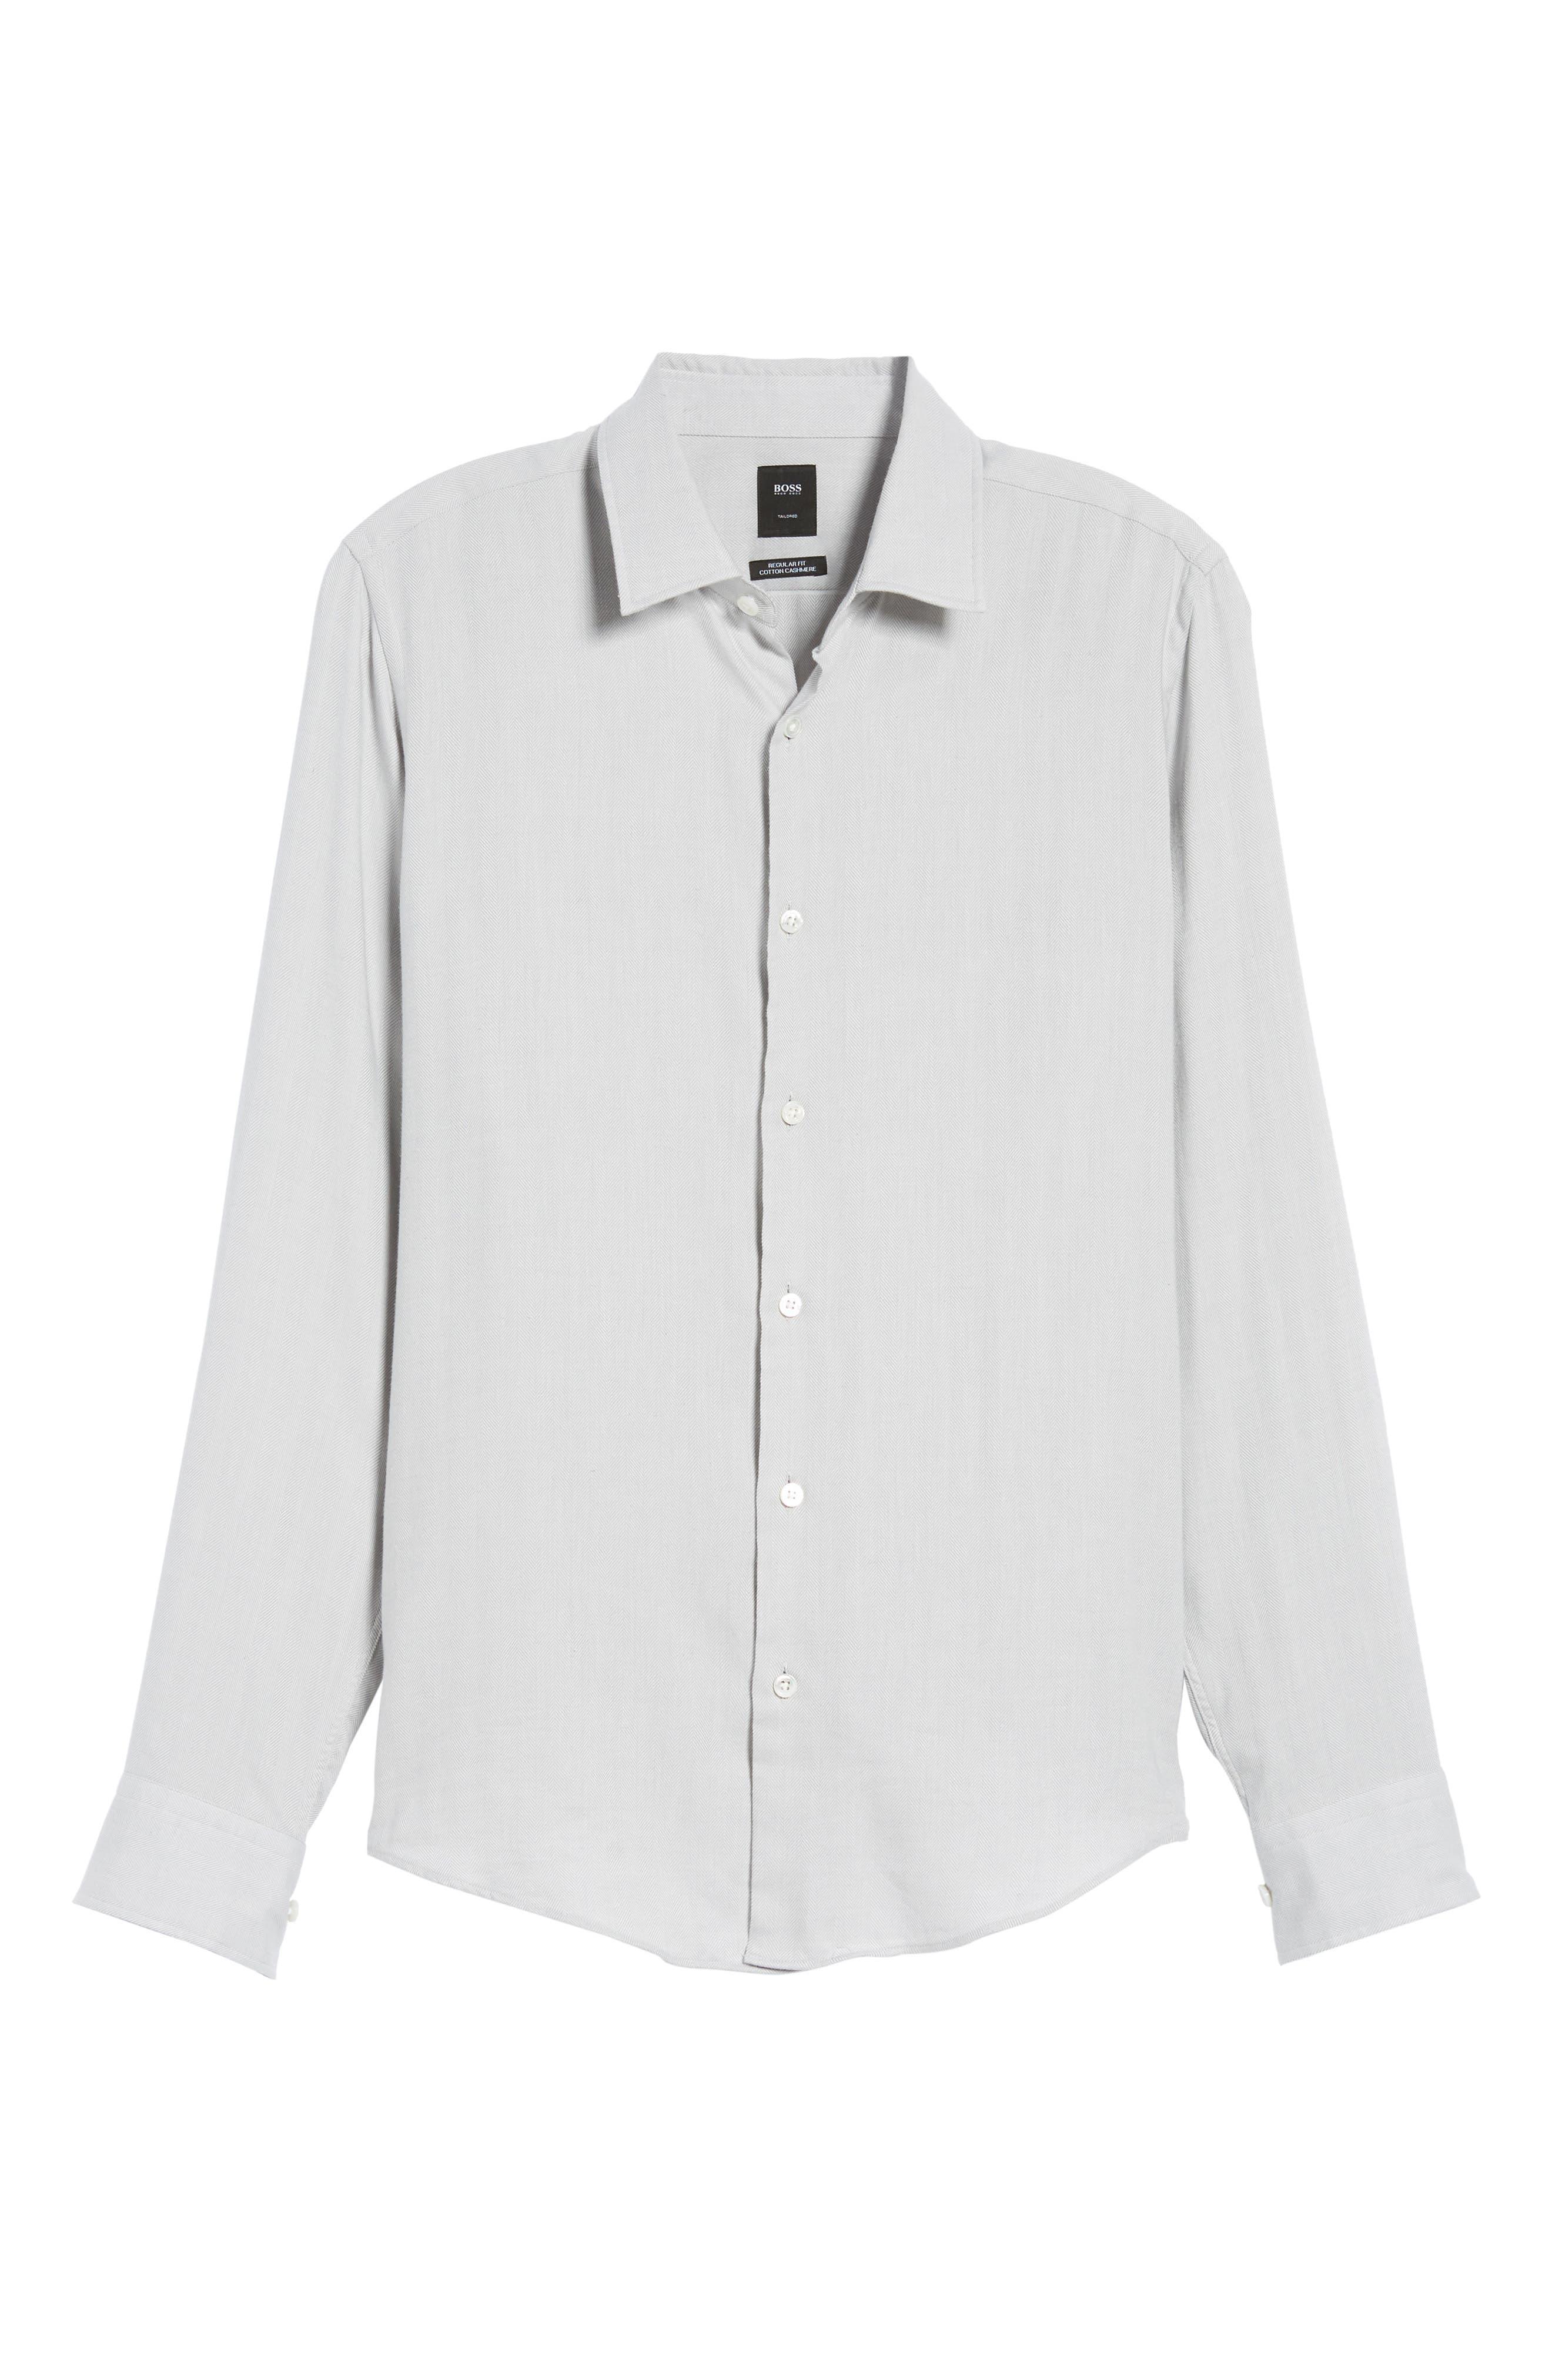 Landon Herringbone Shirt,                             Alternate thumbnail 6, color,                             Grey